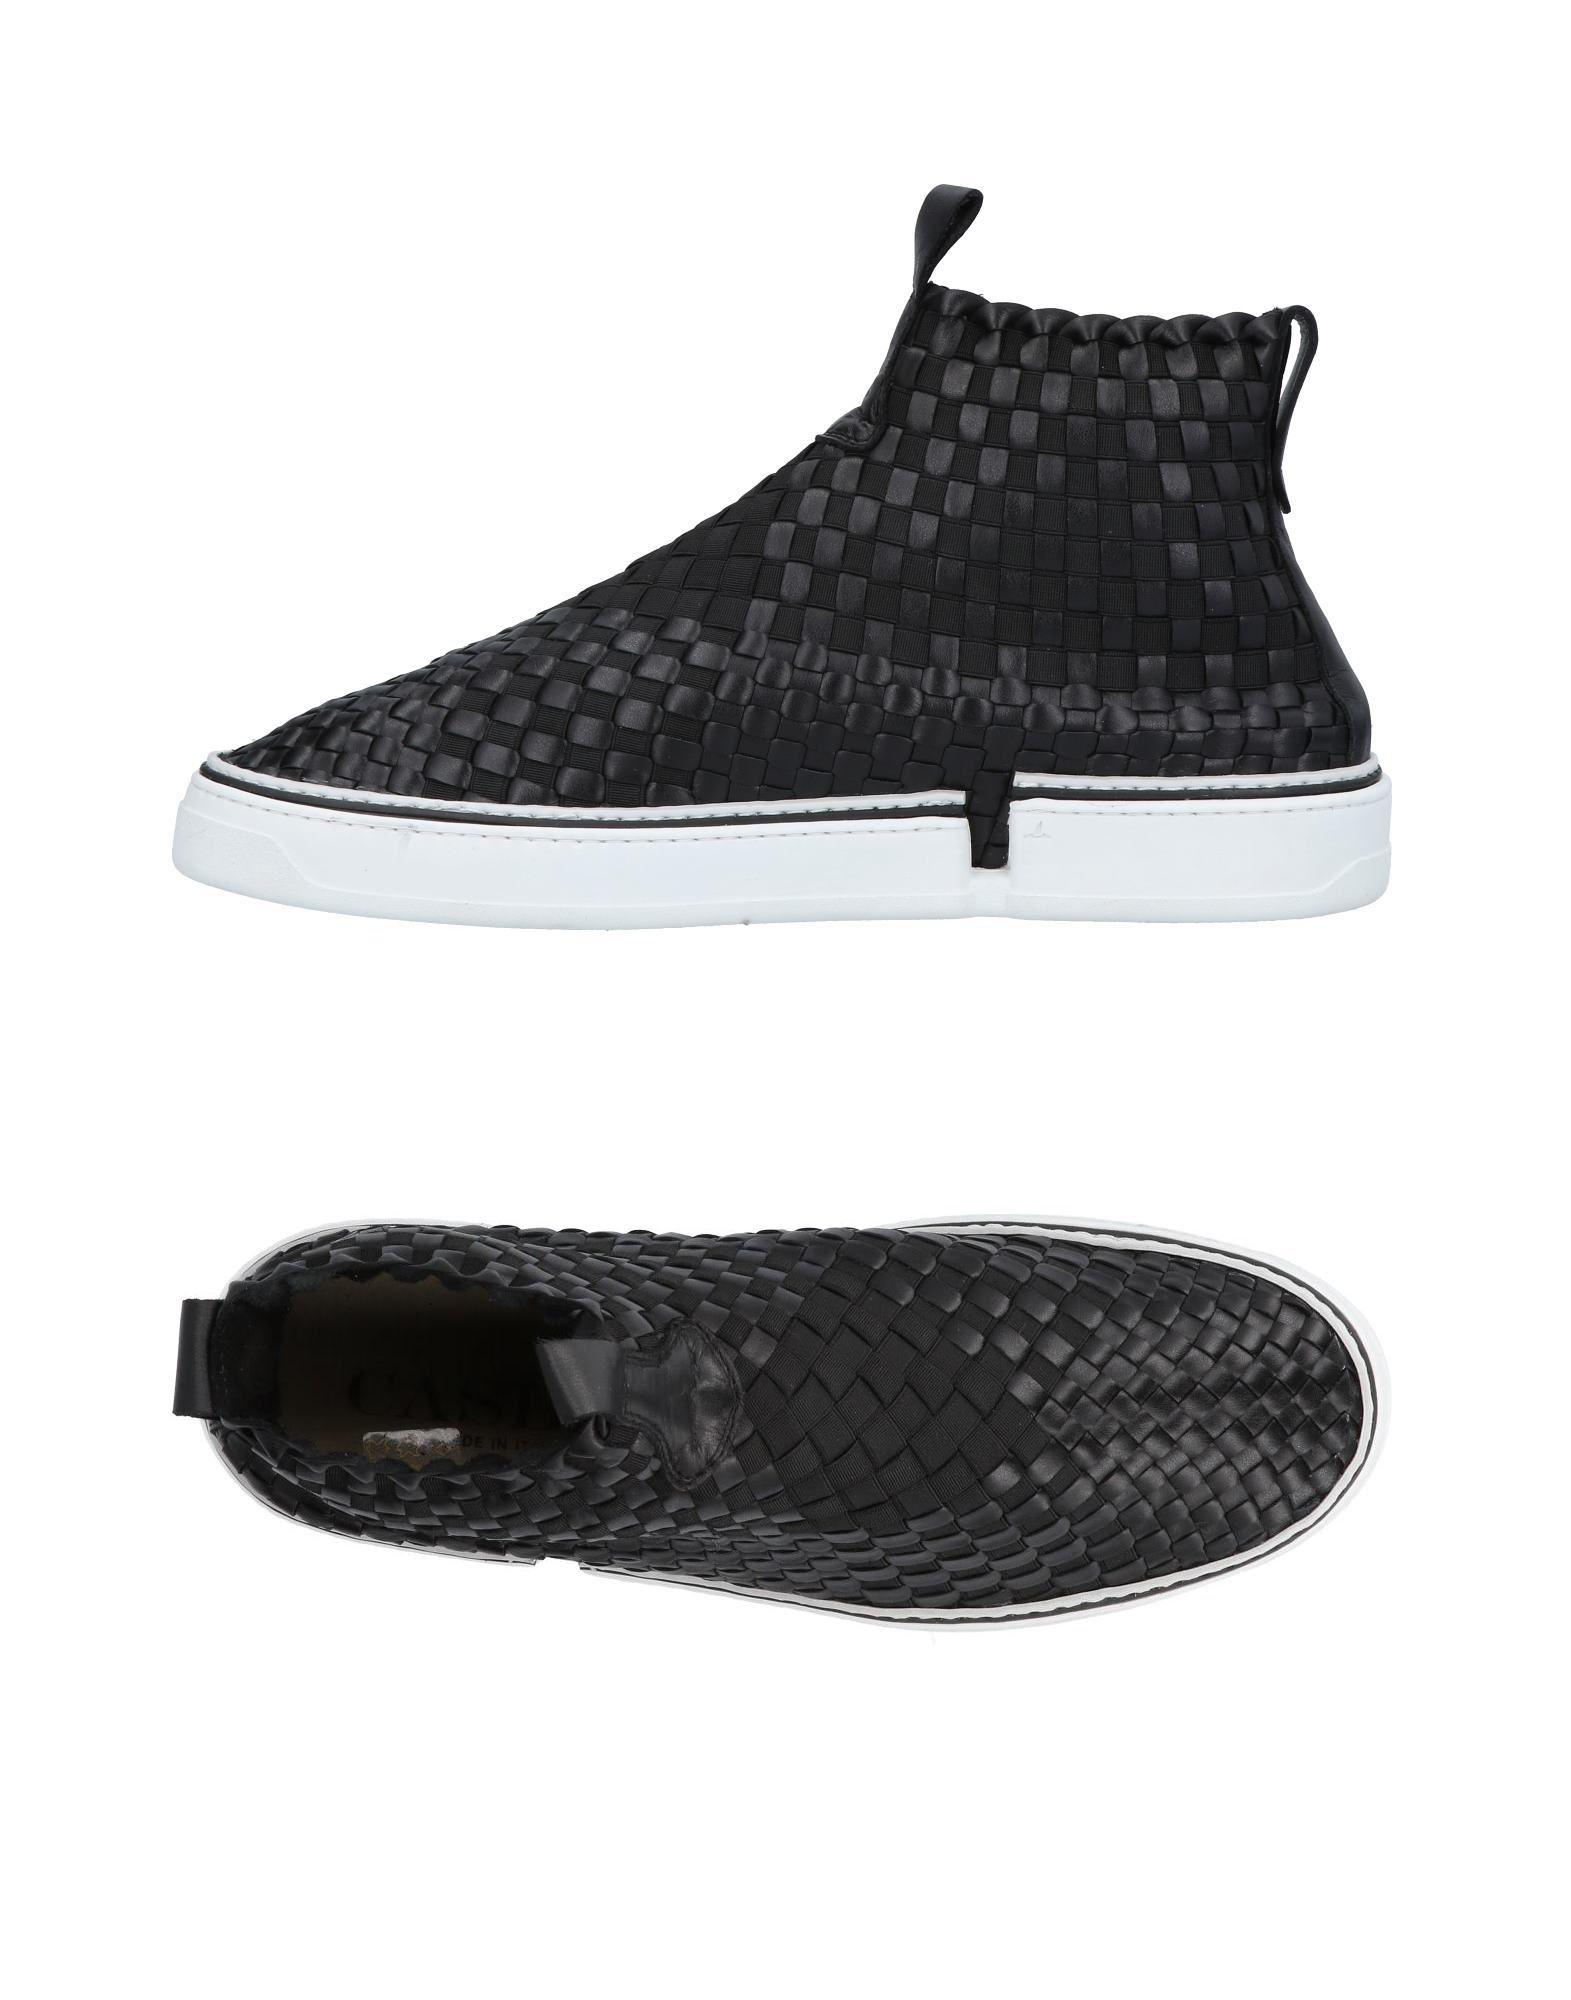 Moda Sneakers Casbia Uomo Uomo Casbia - 11452917DK d23da2